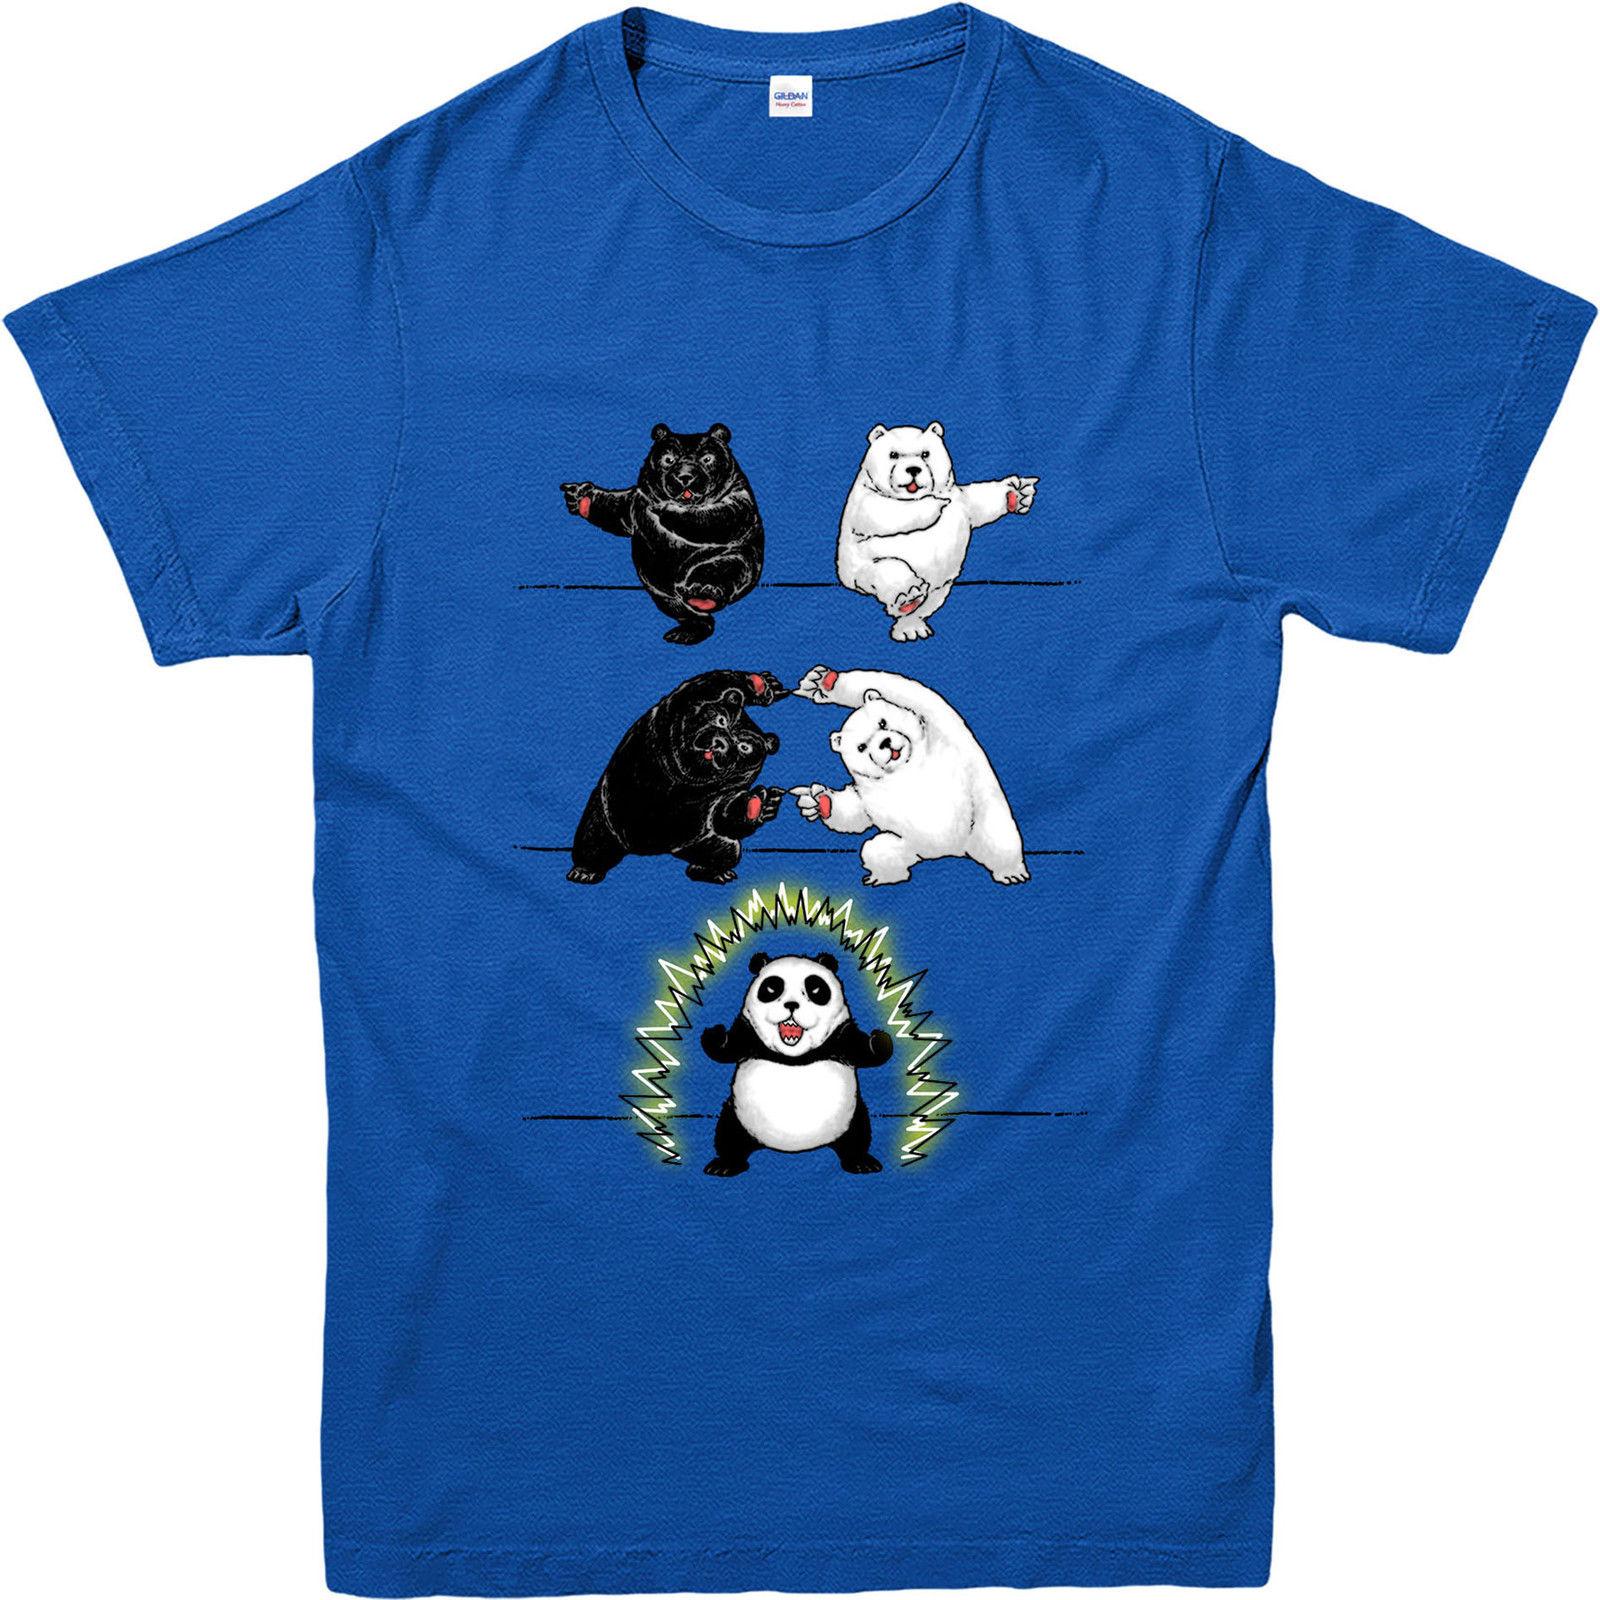 dragon ball z t shirt bear fusion panda t shirt funny. Black Bedroom Furniture Sets. Home Design Ideas